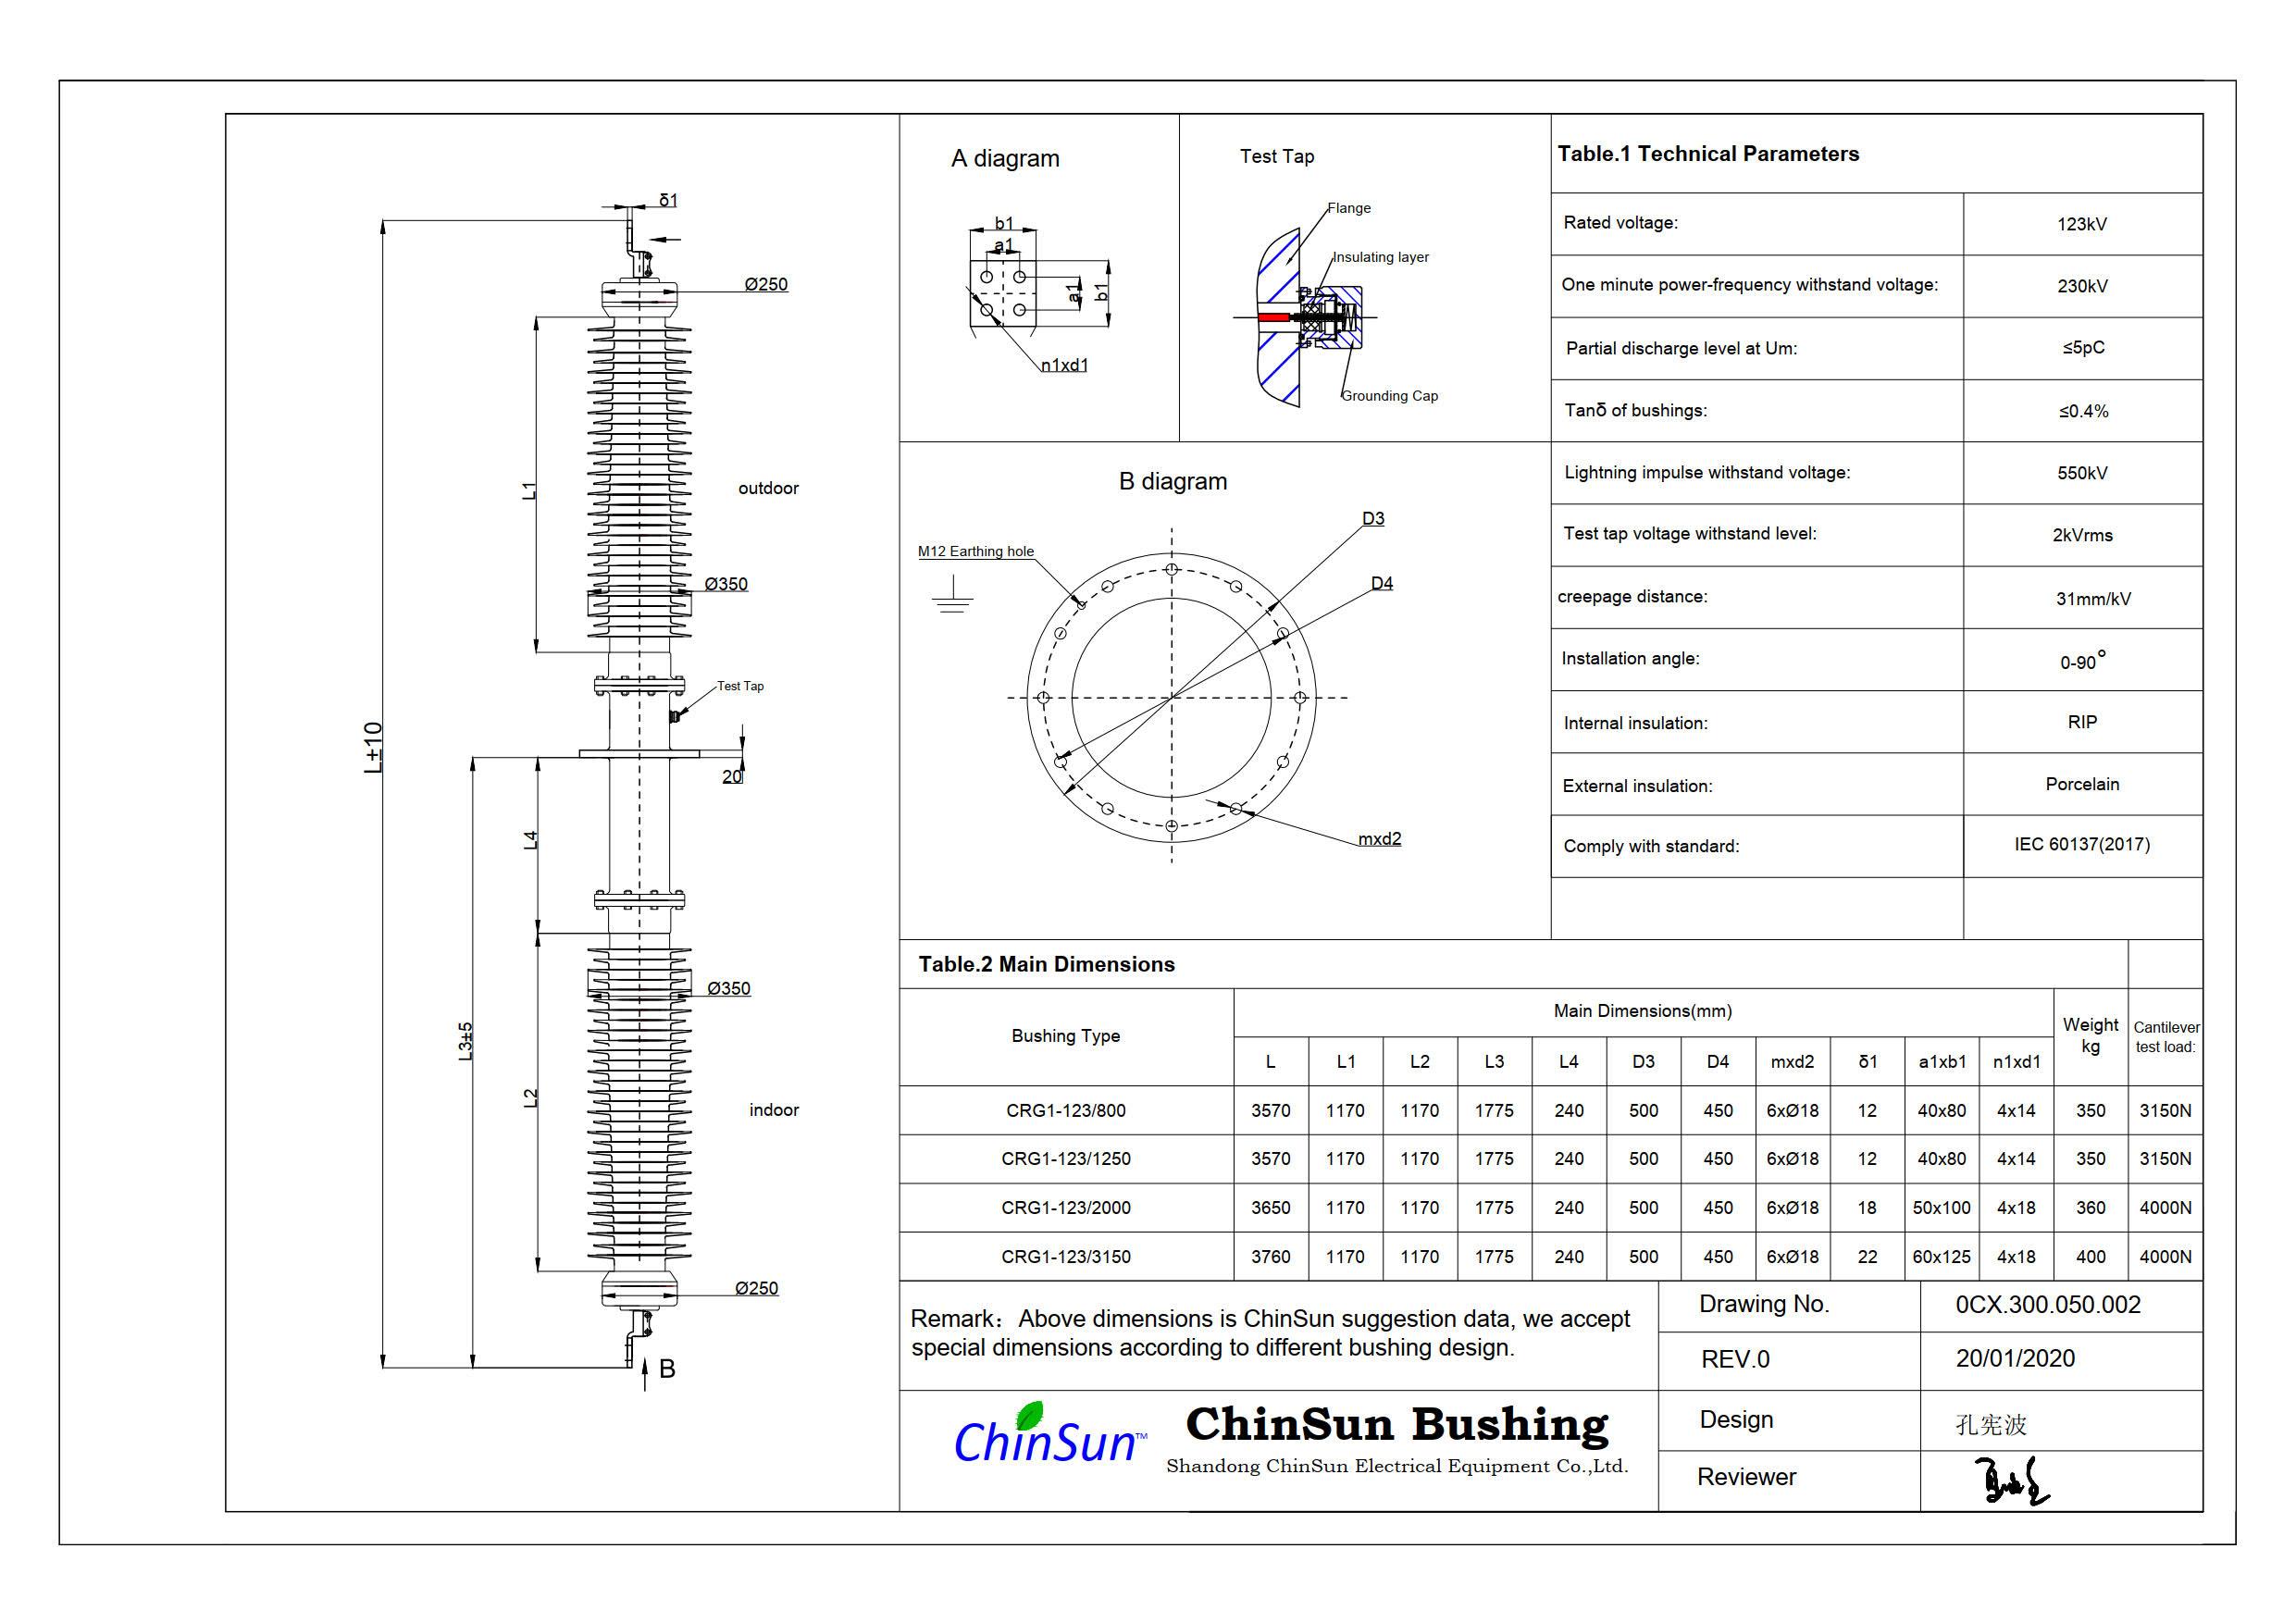 Drawing-wall bushing-123kV porcelain-ChinSun